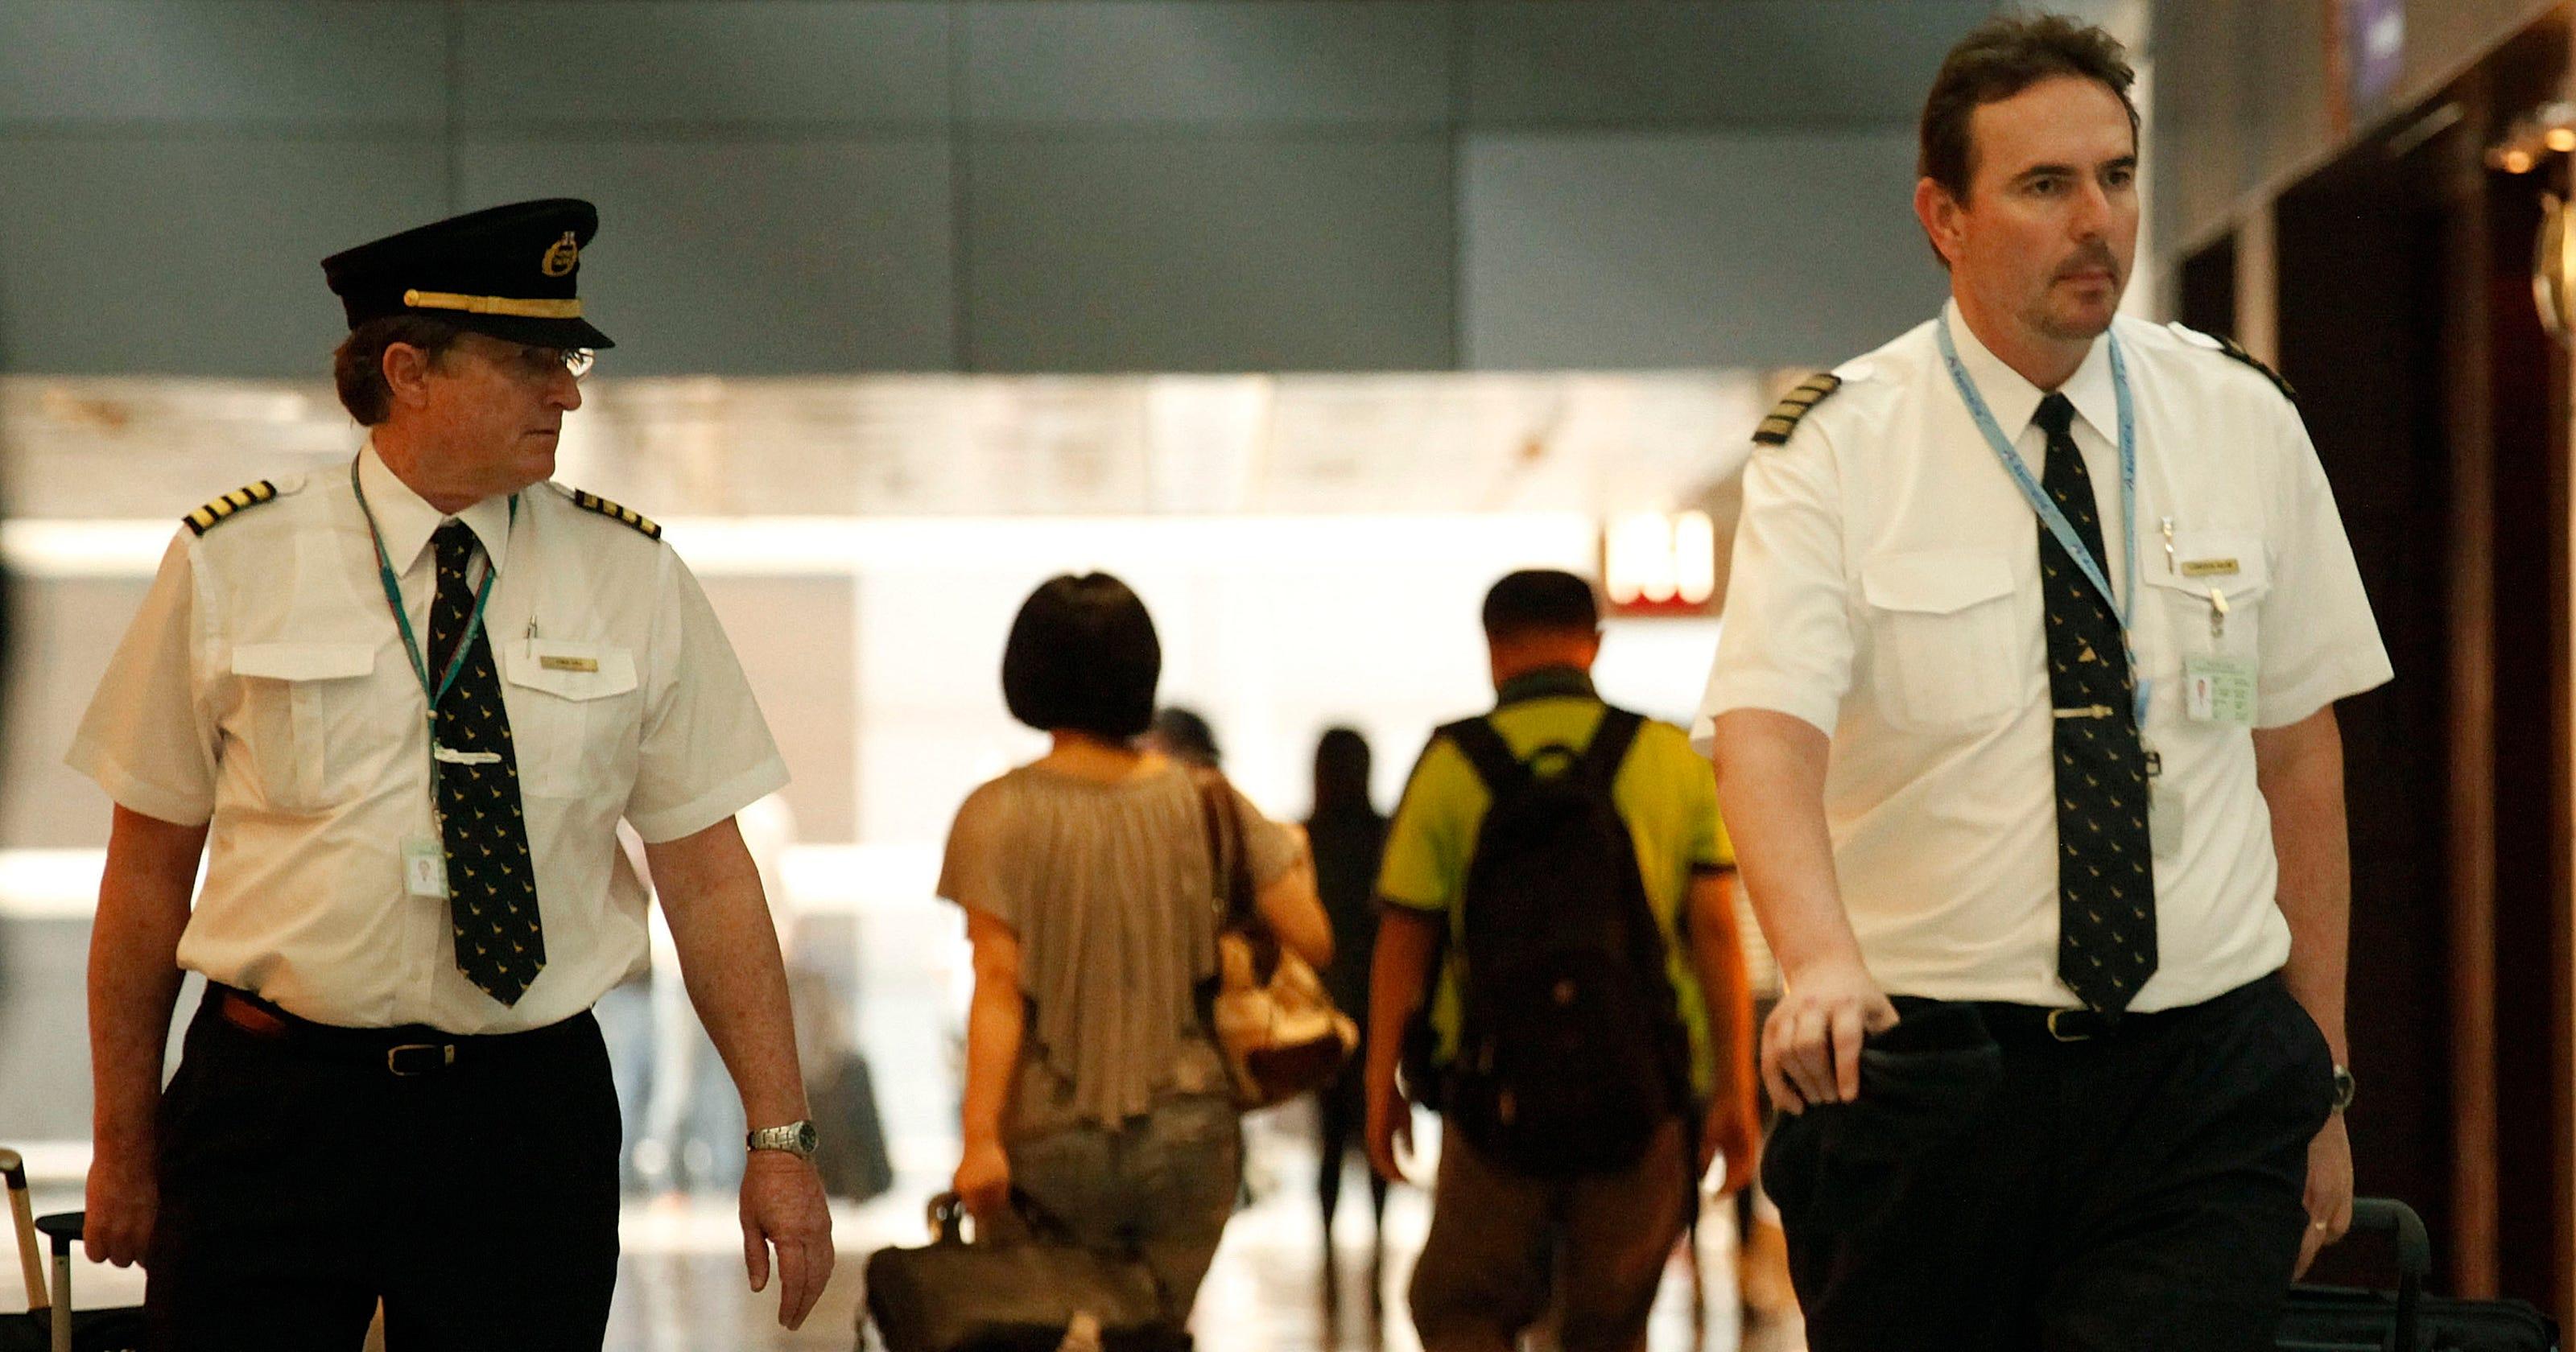 Cockpit crisis: Regional airlines struggle to hire pilots